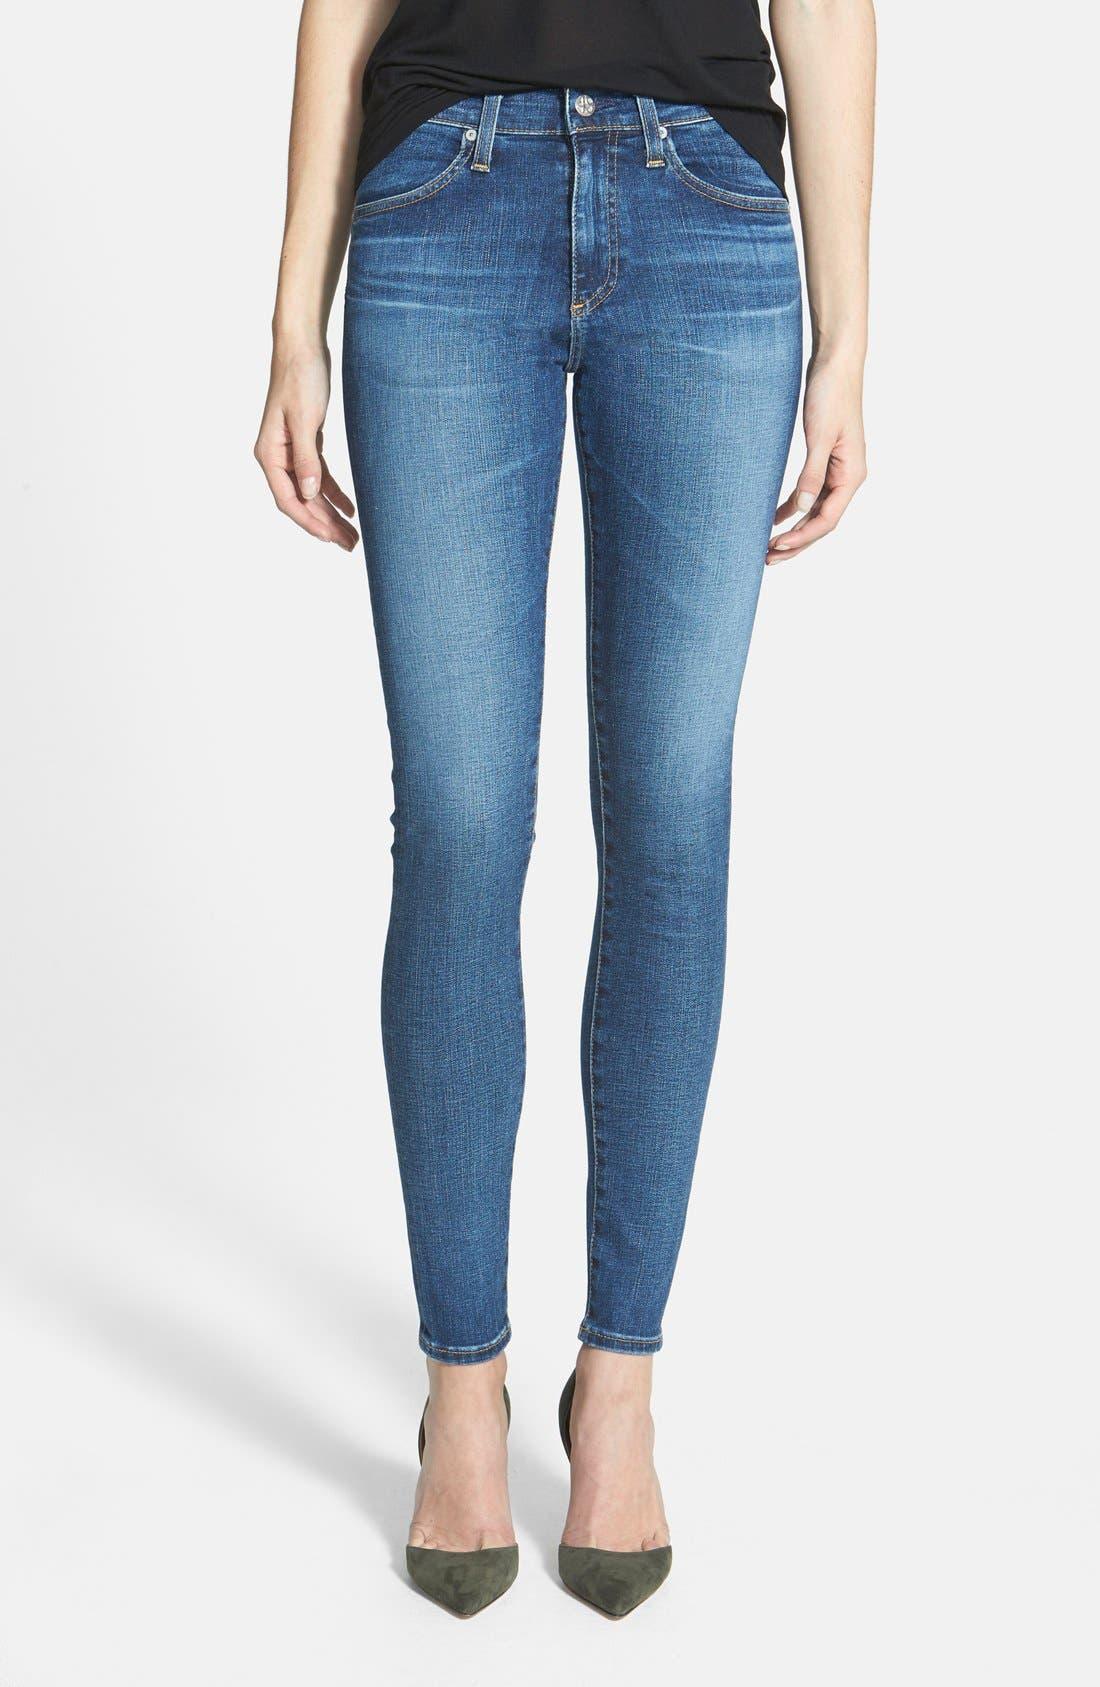 'The Farrah' High Rise Skinny Jeans,                             Main thumbnail 8, color,